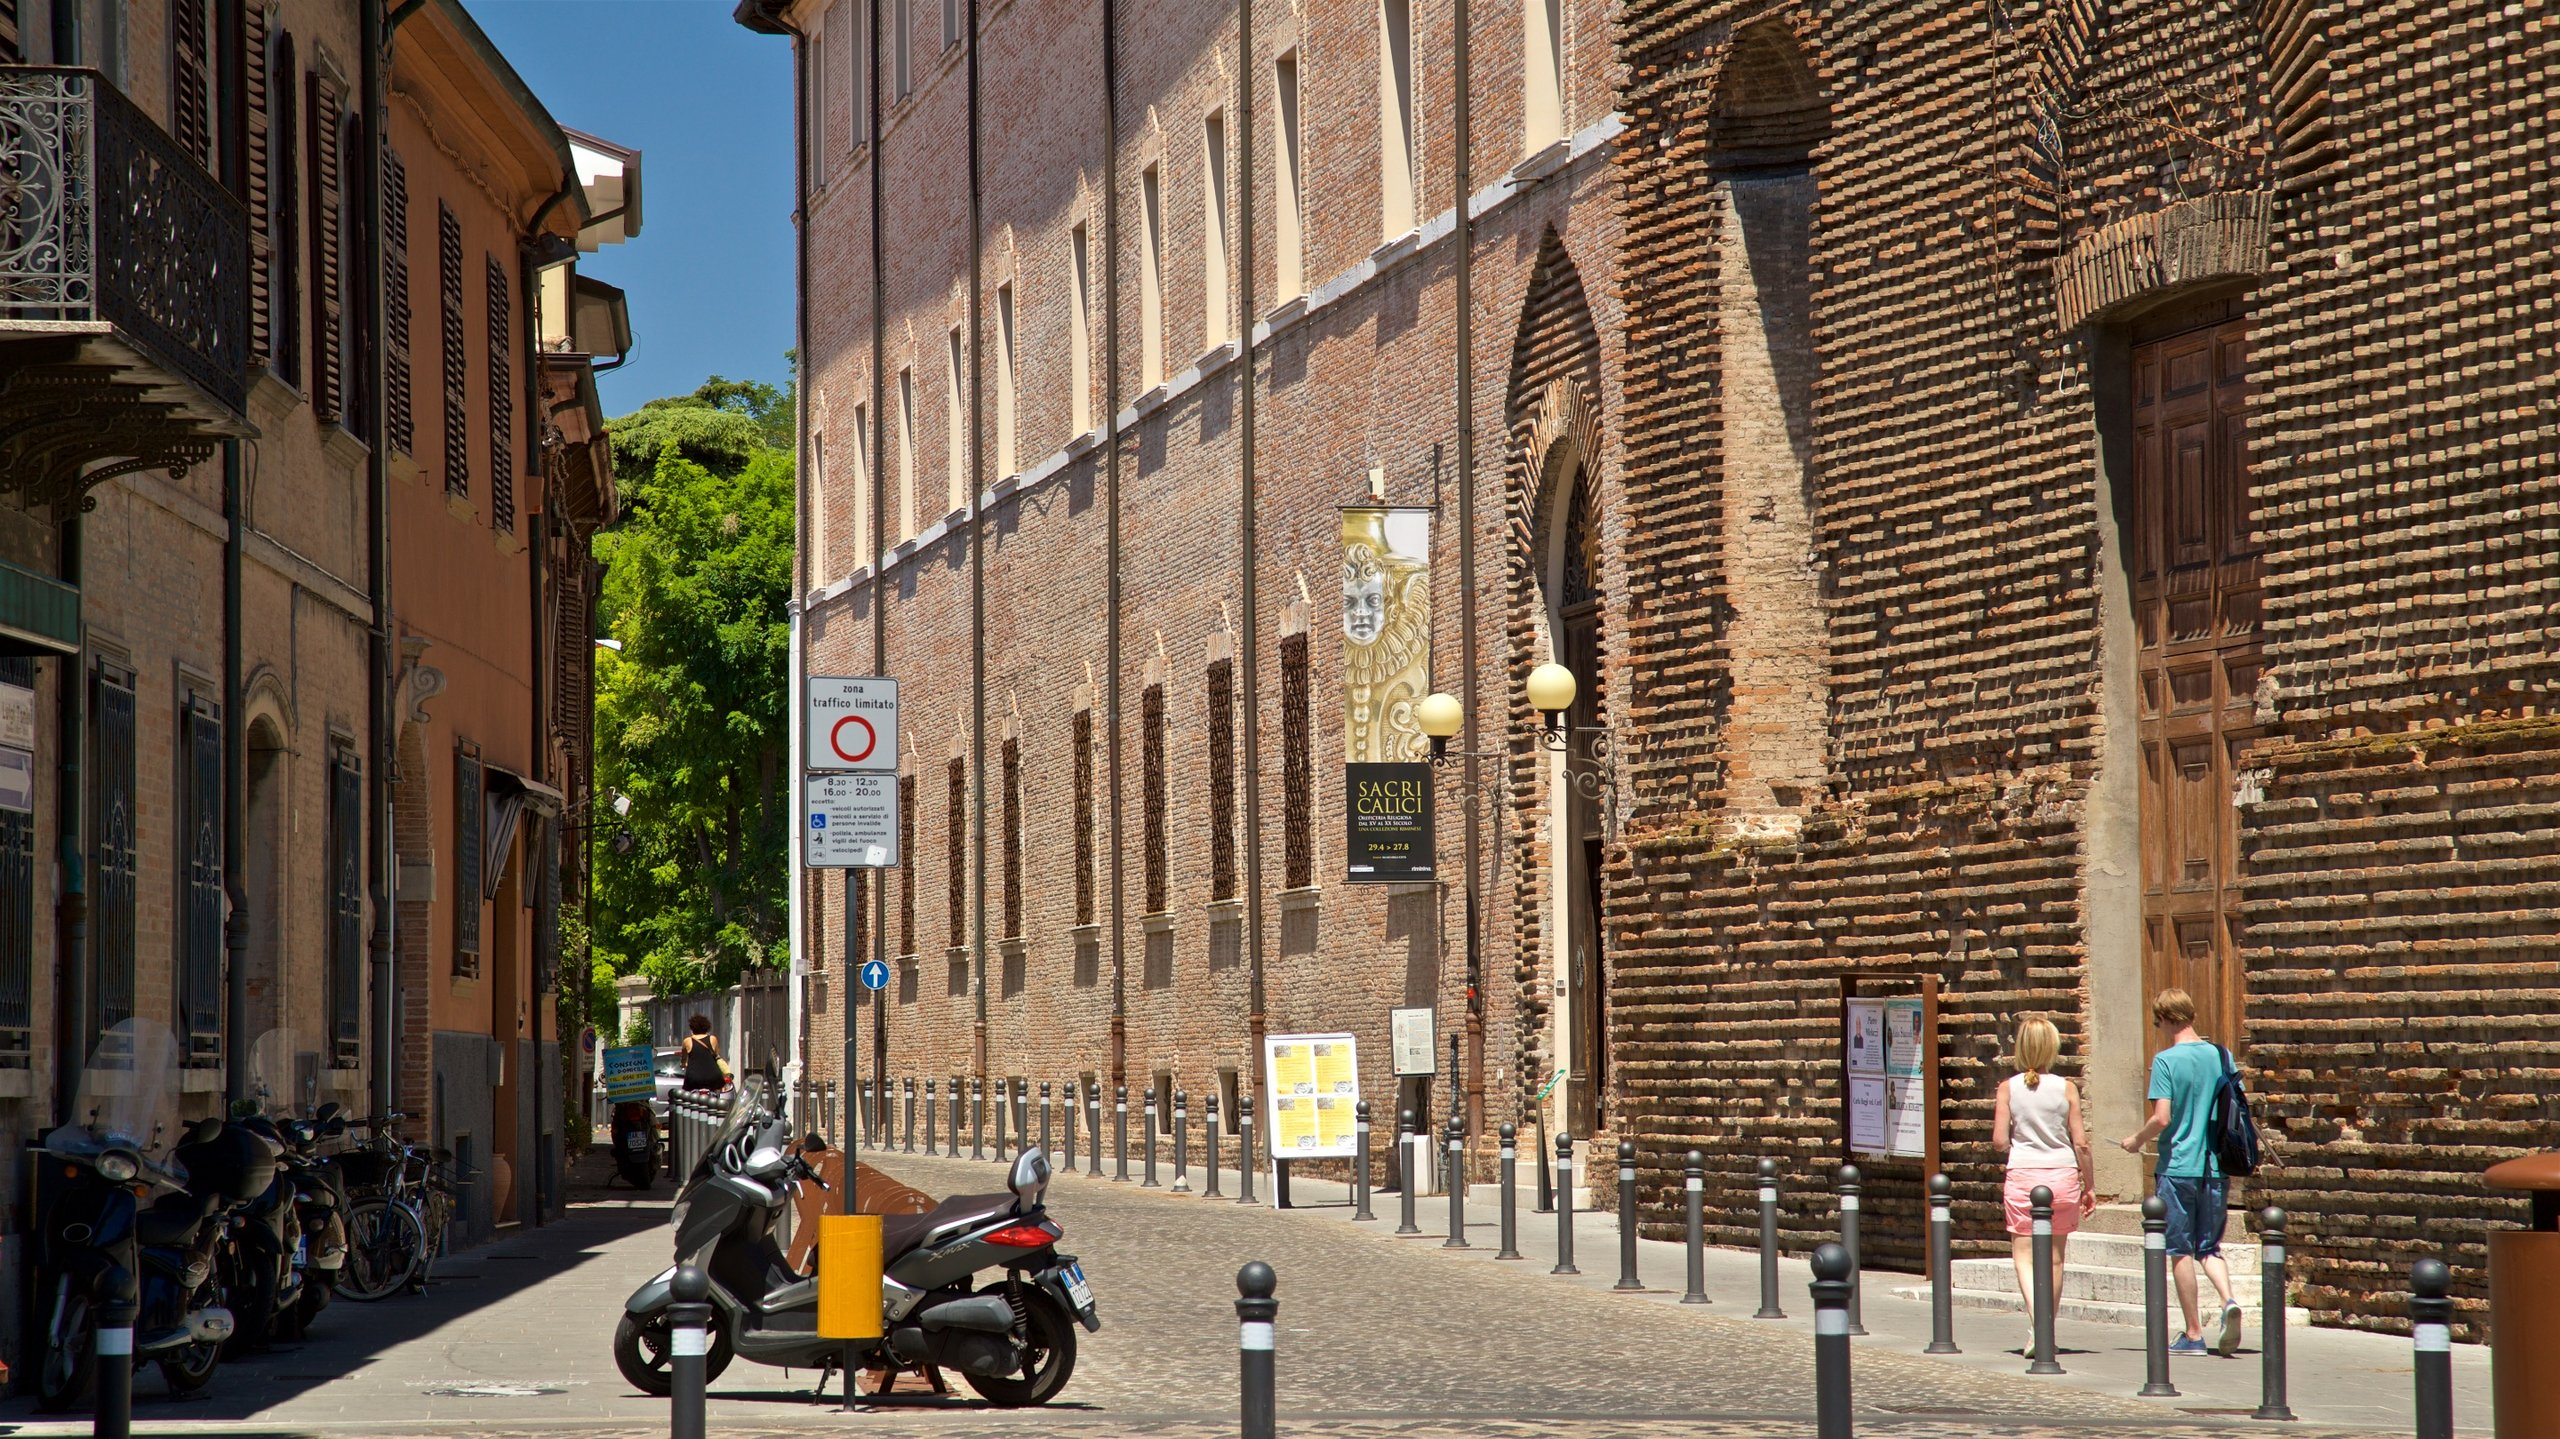 Museo Civico di Rimini, Rimini, Emilia Romagna, Italia